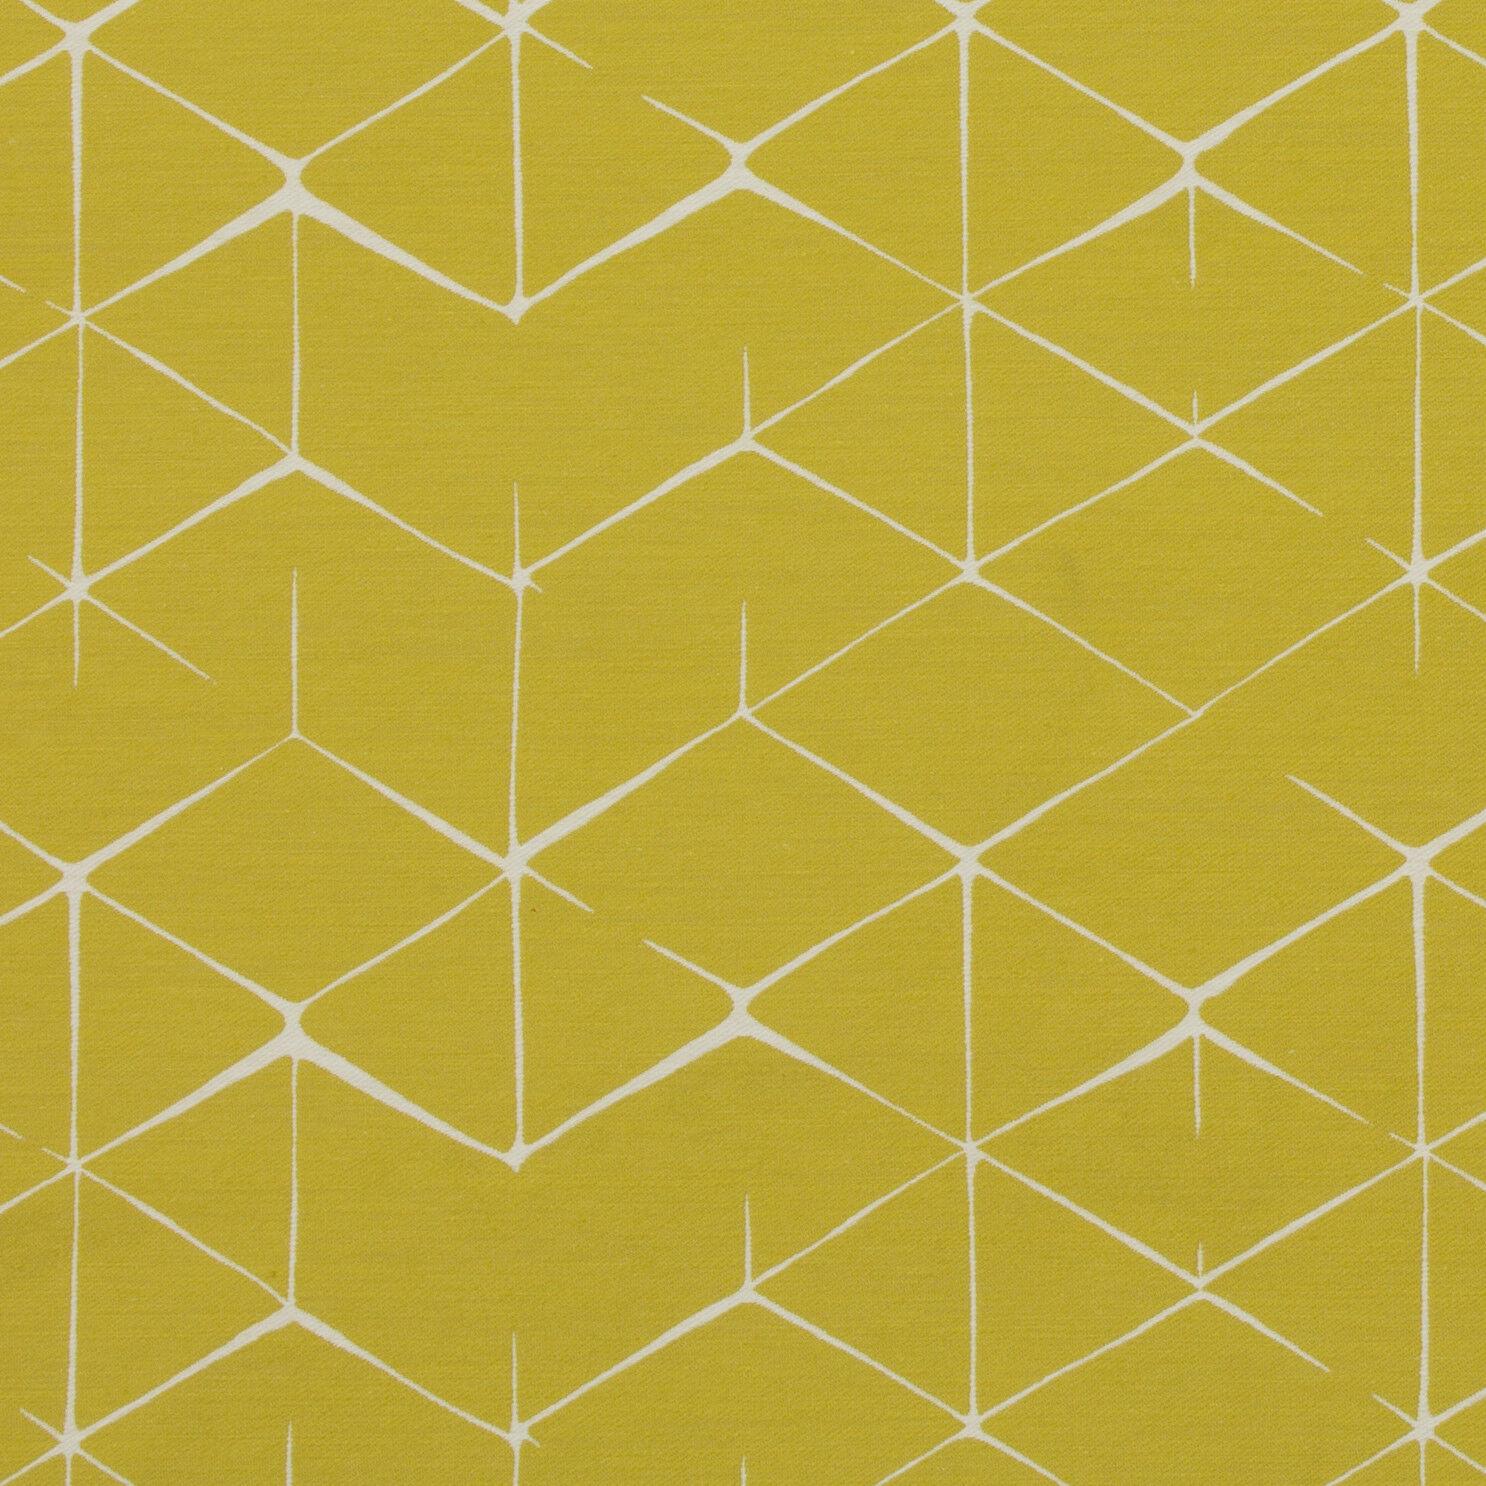 Curtains - Kai - Danika Gold (Front Side) - Pencil Pleat, Eyelet, Tab Top